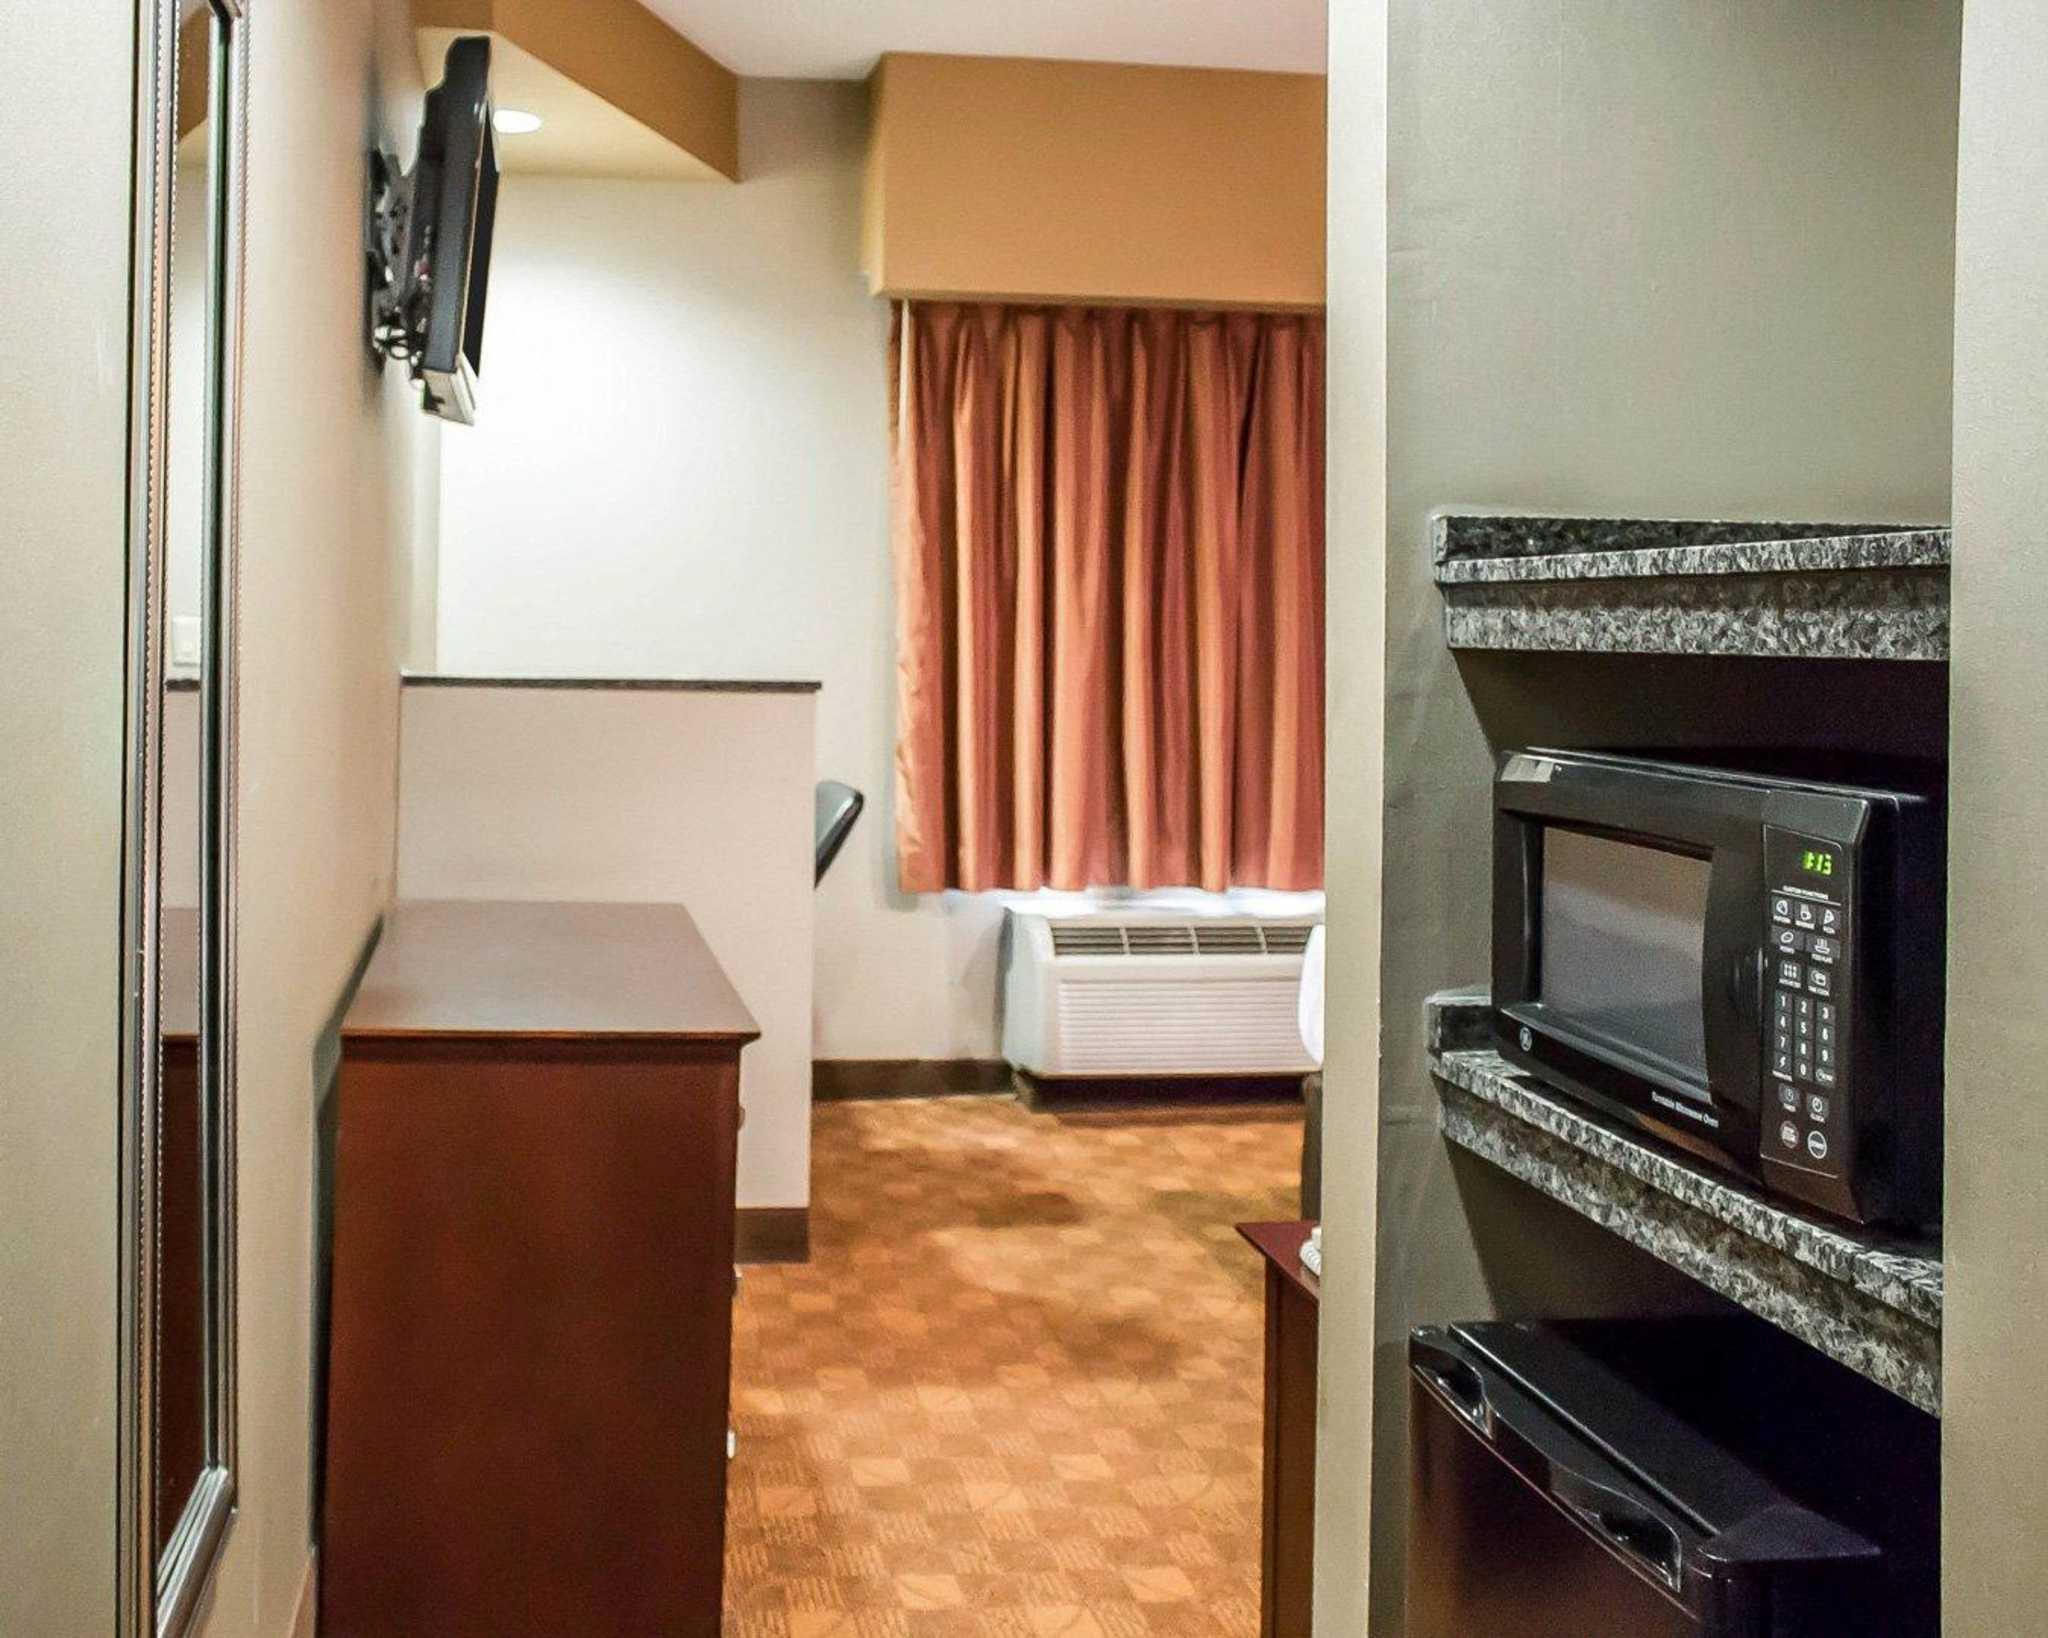 Comfort Suites Perrysburg - Toledo South image 5